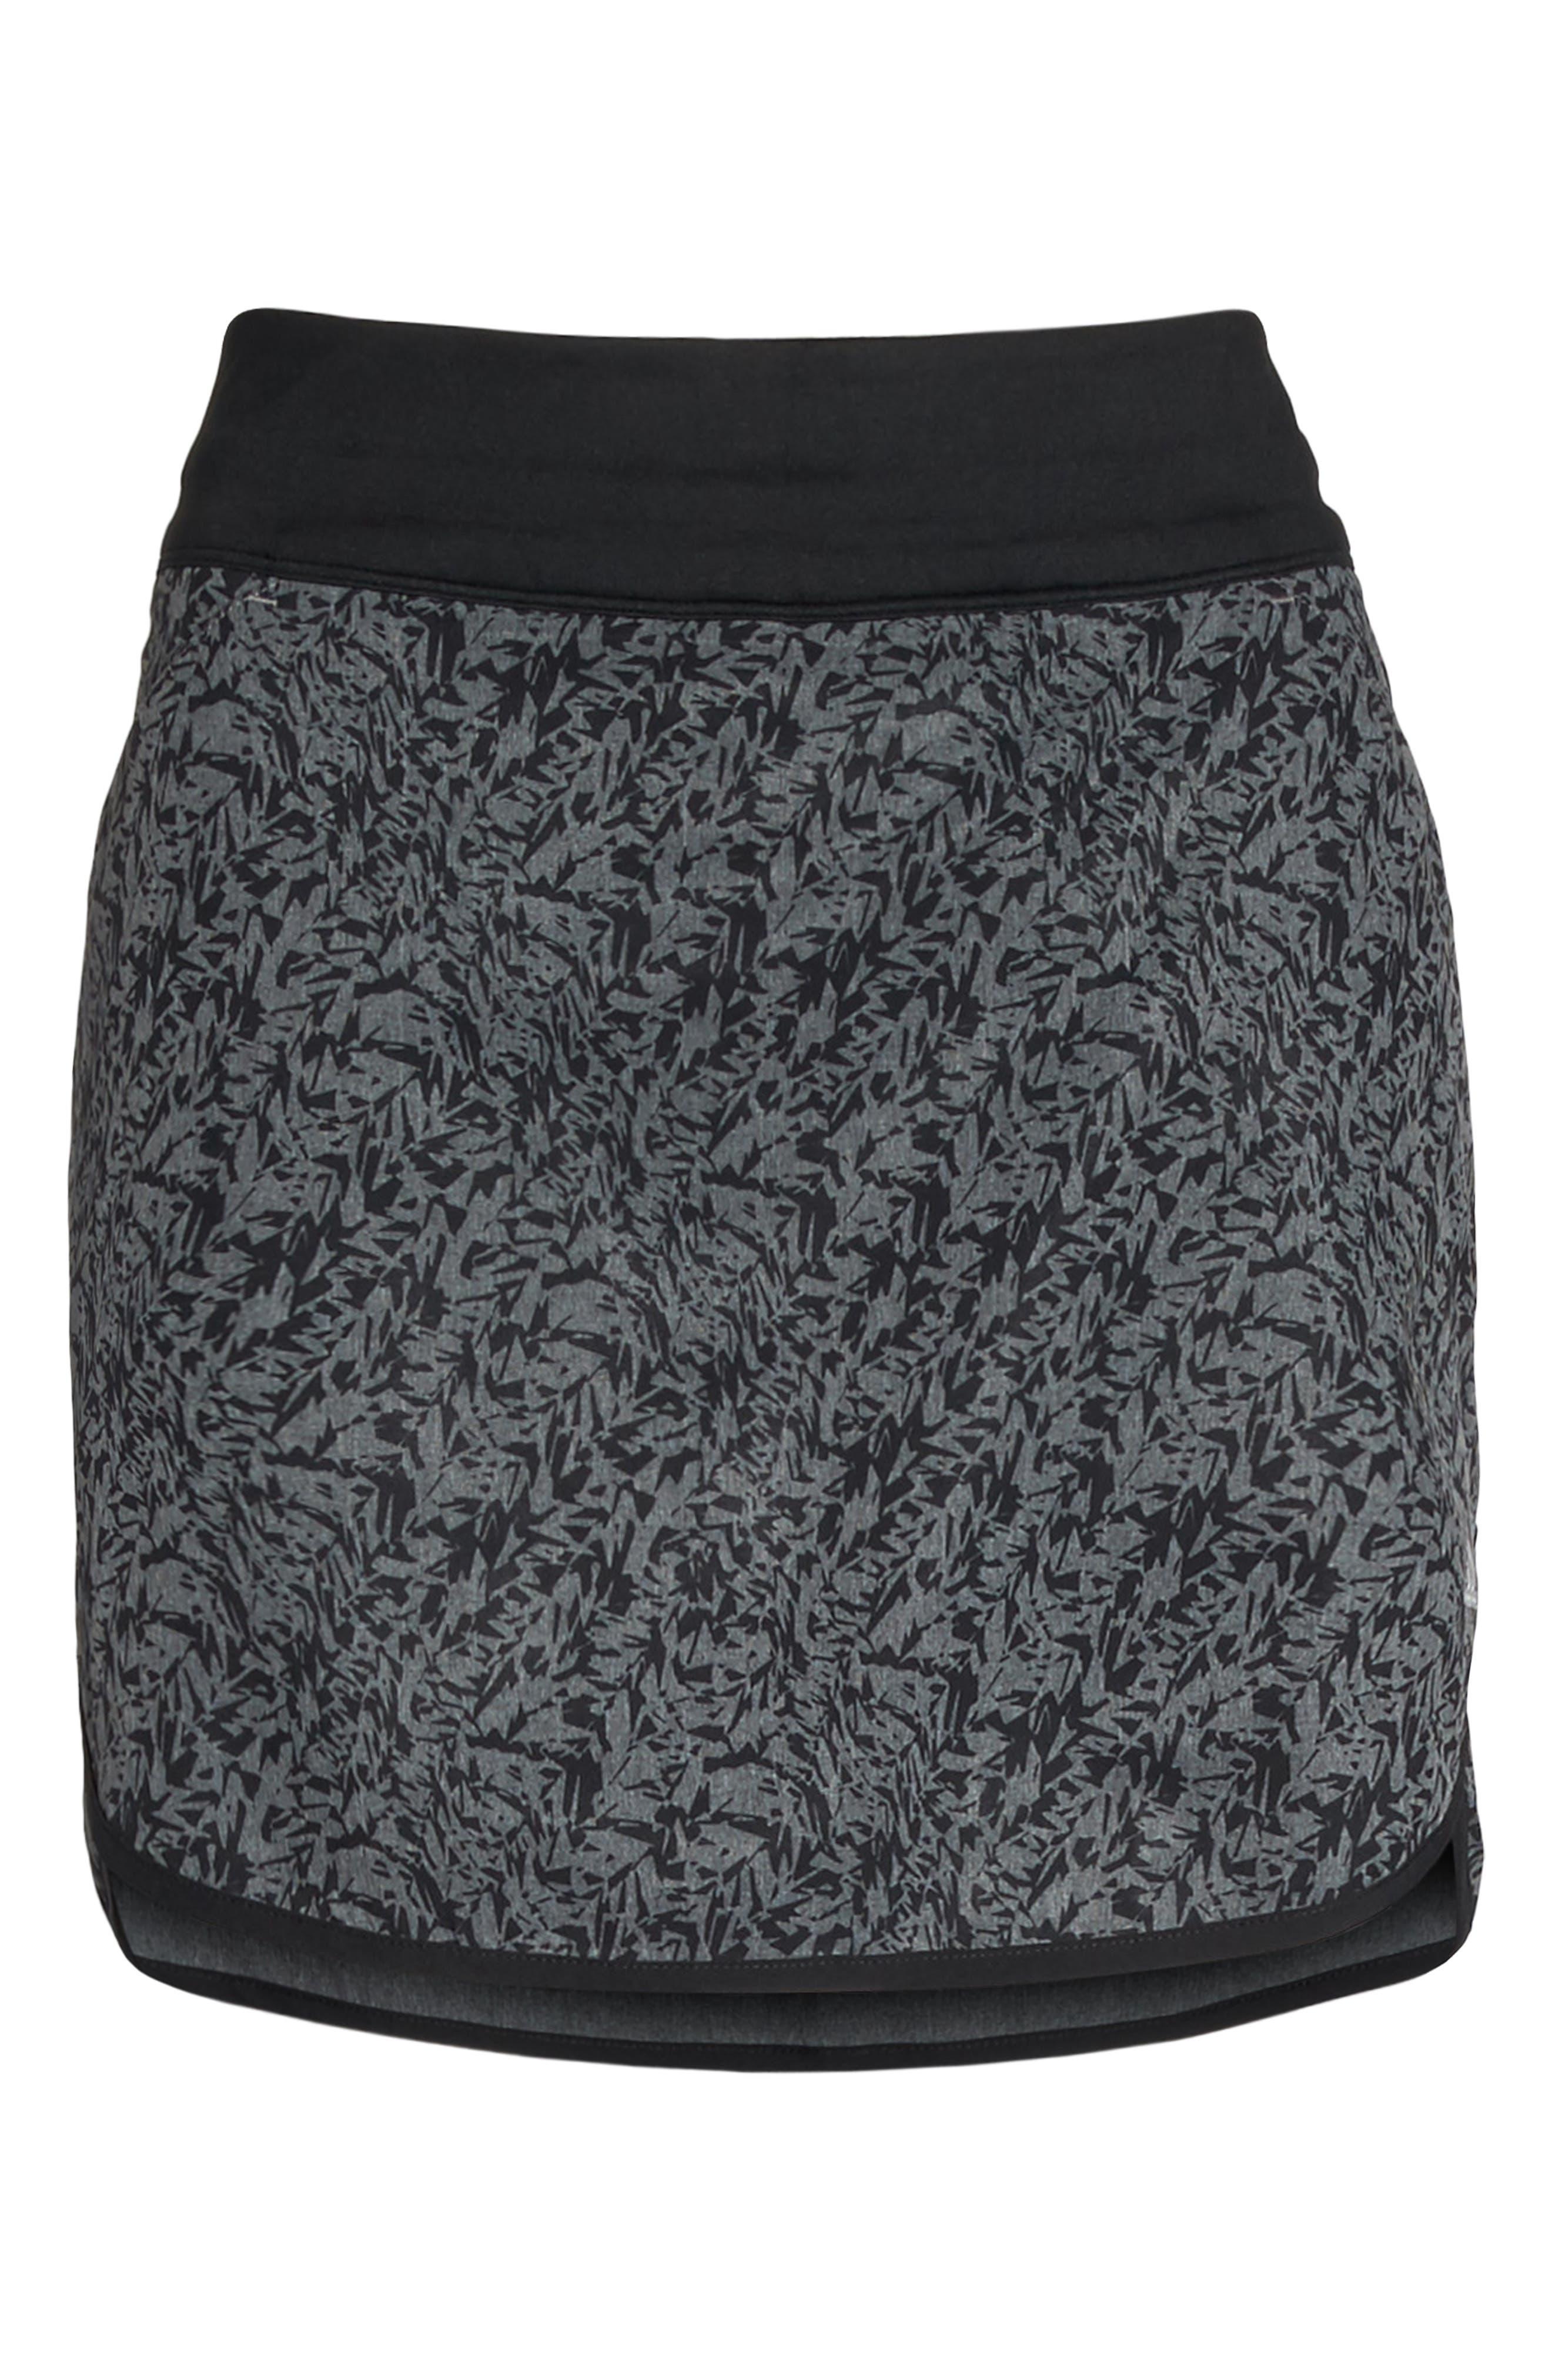 Rangewear Skort,                             Alternate thumbnail 12, color,